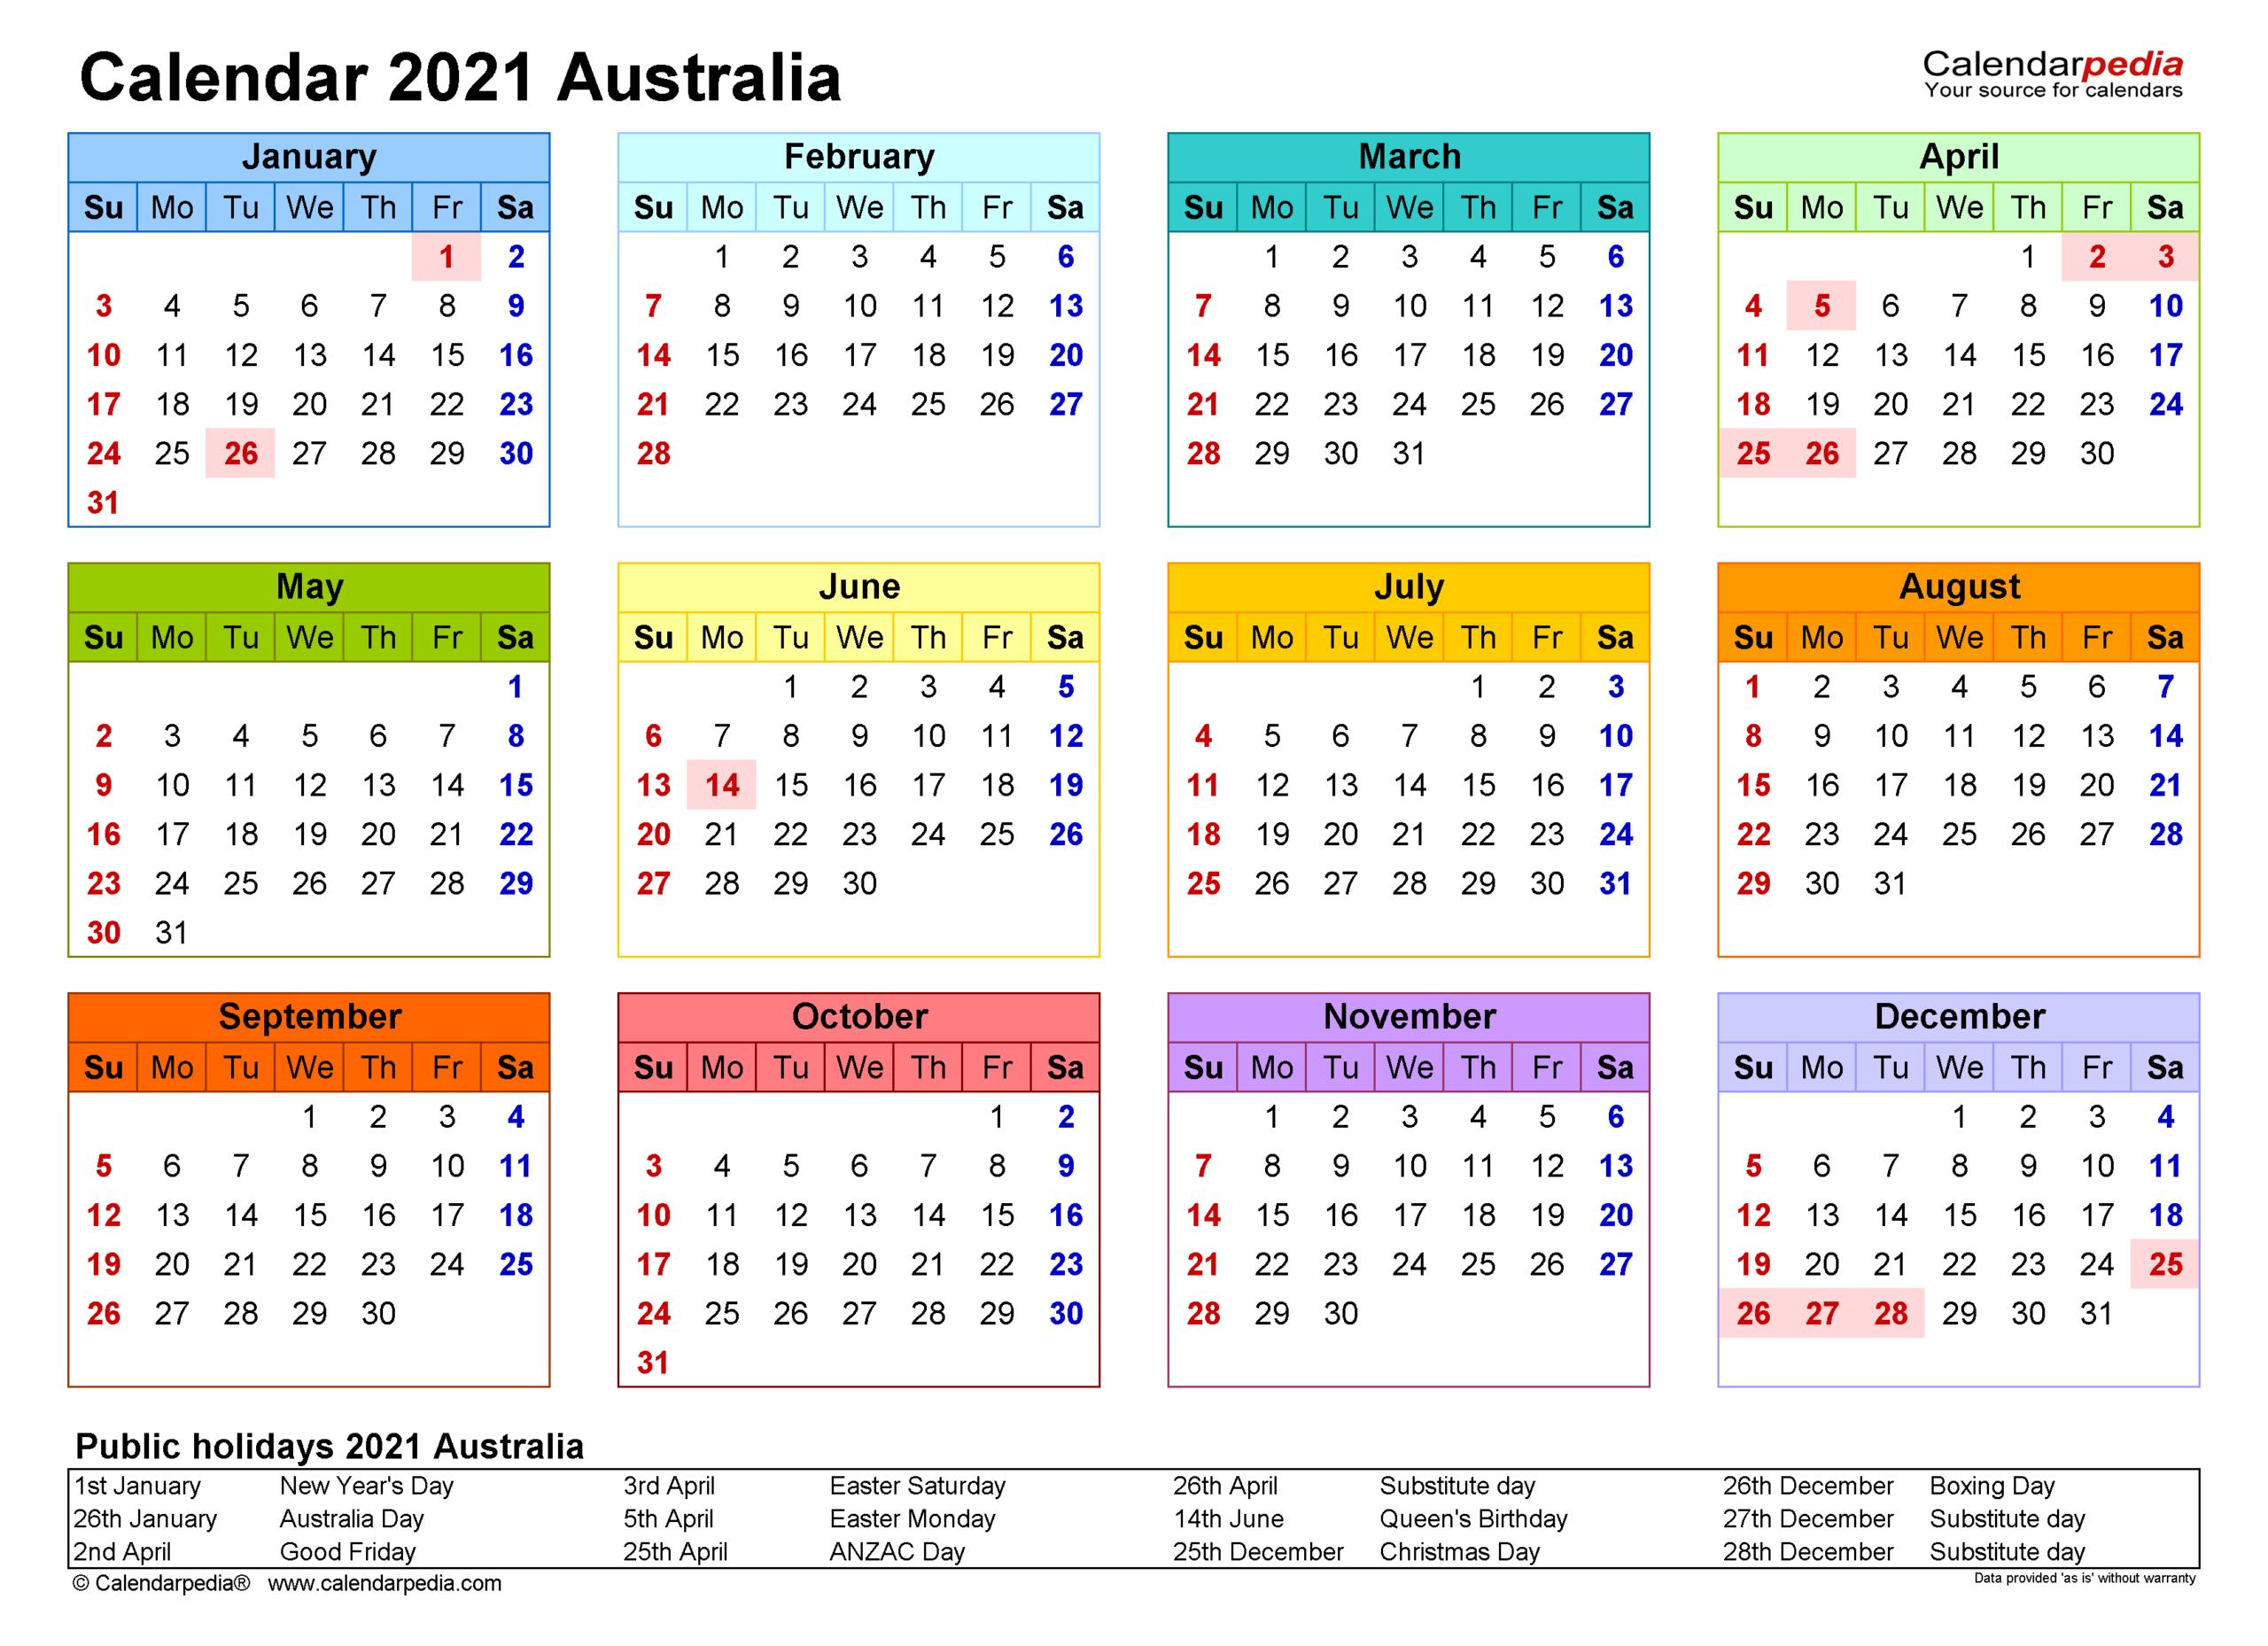 Australia Calendar 2021 - Free Printable Pdf Templates in Pocket Calendar 2021-2021: Two Year